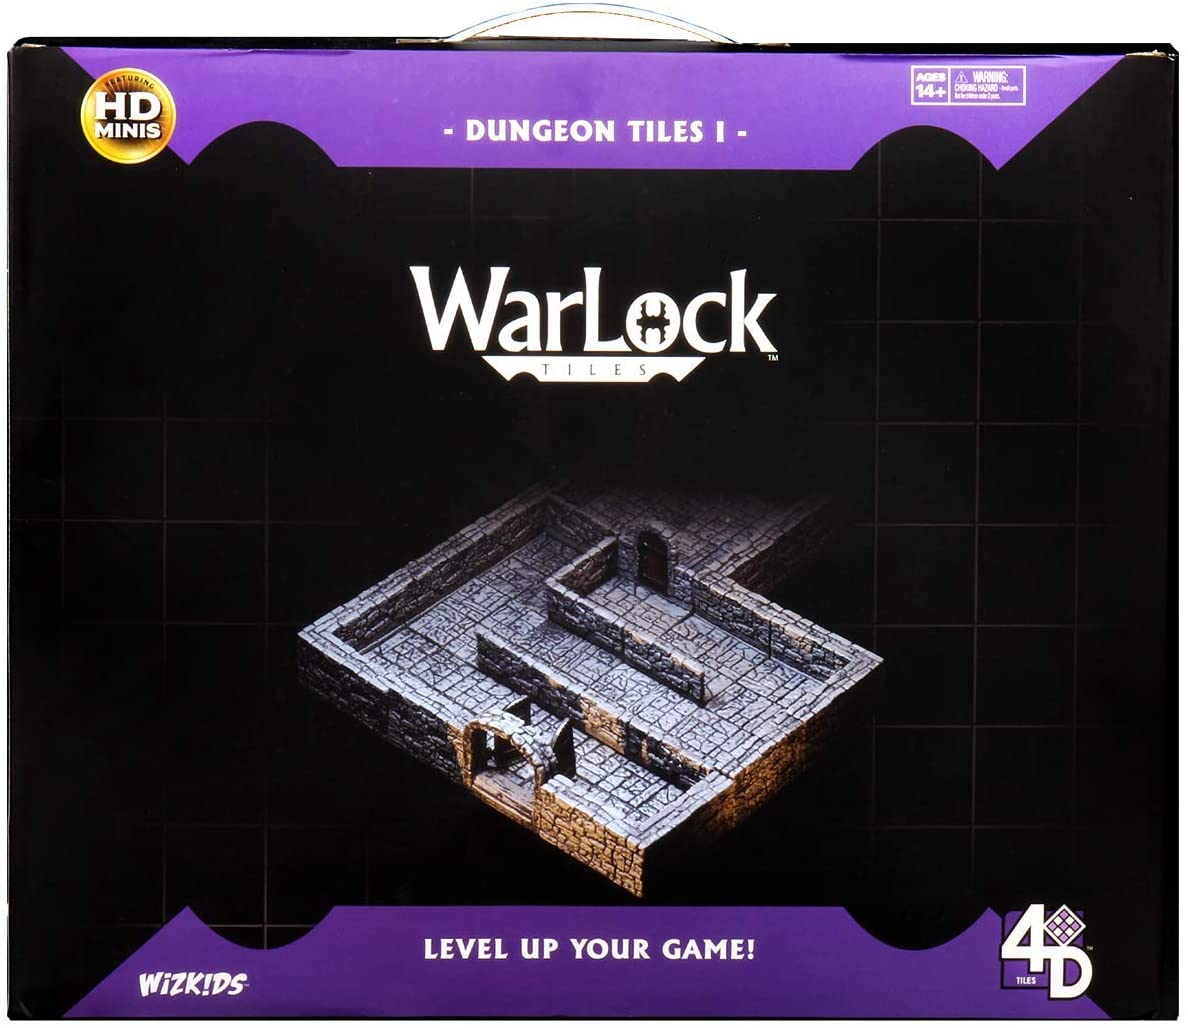 Warlock Tiles Dungeon Tiles I